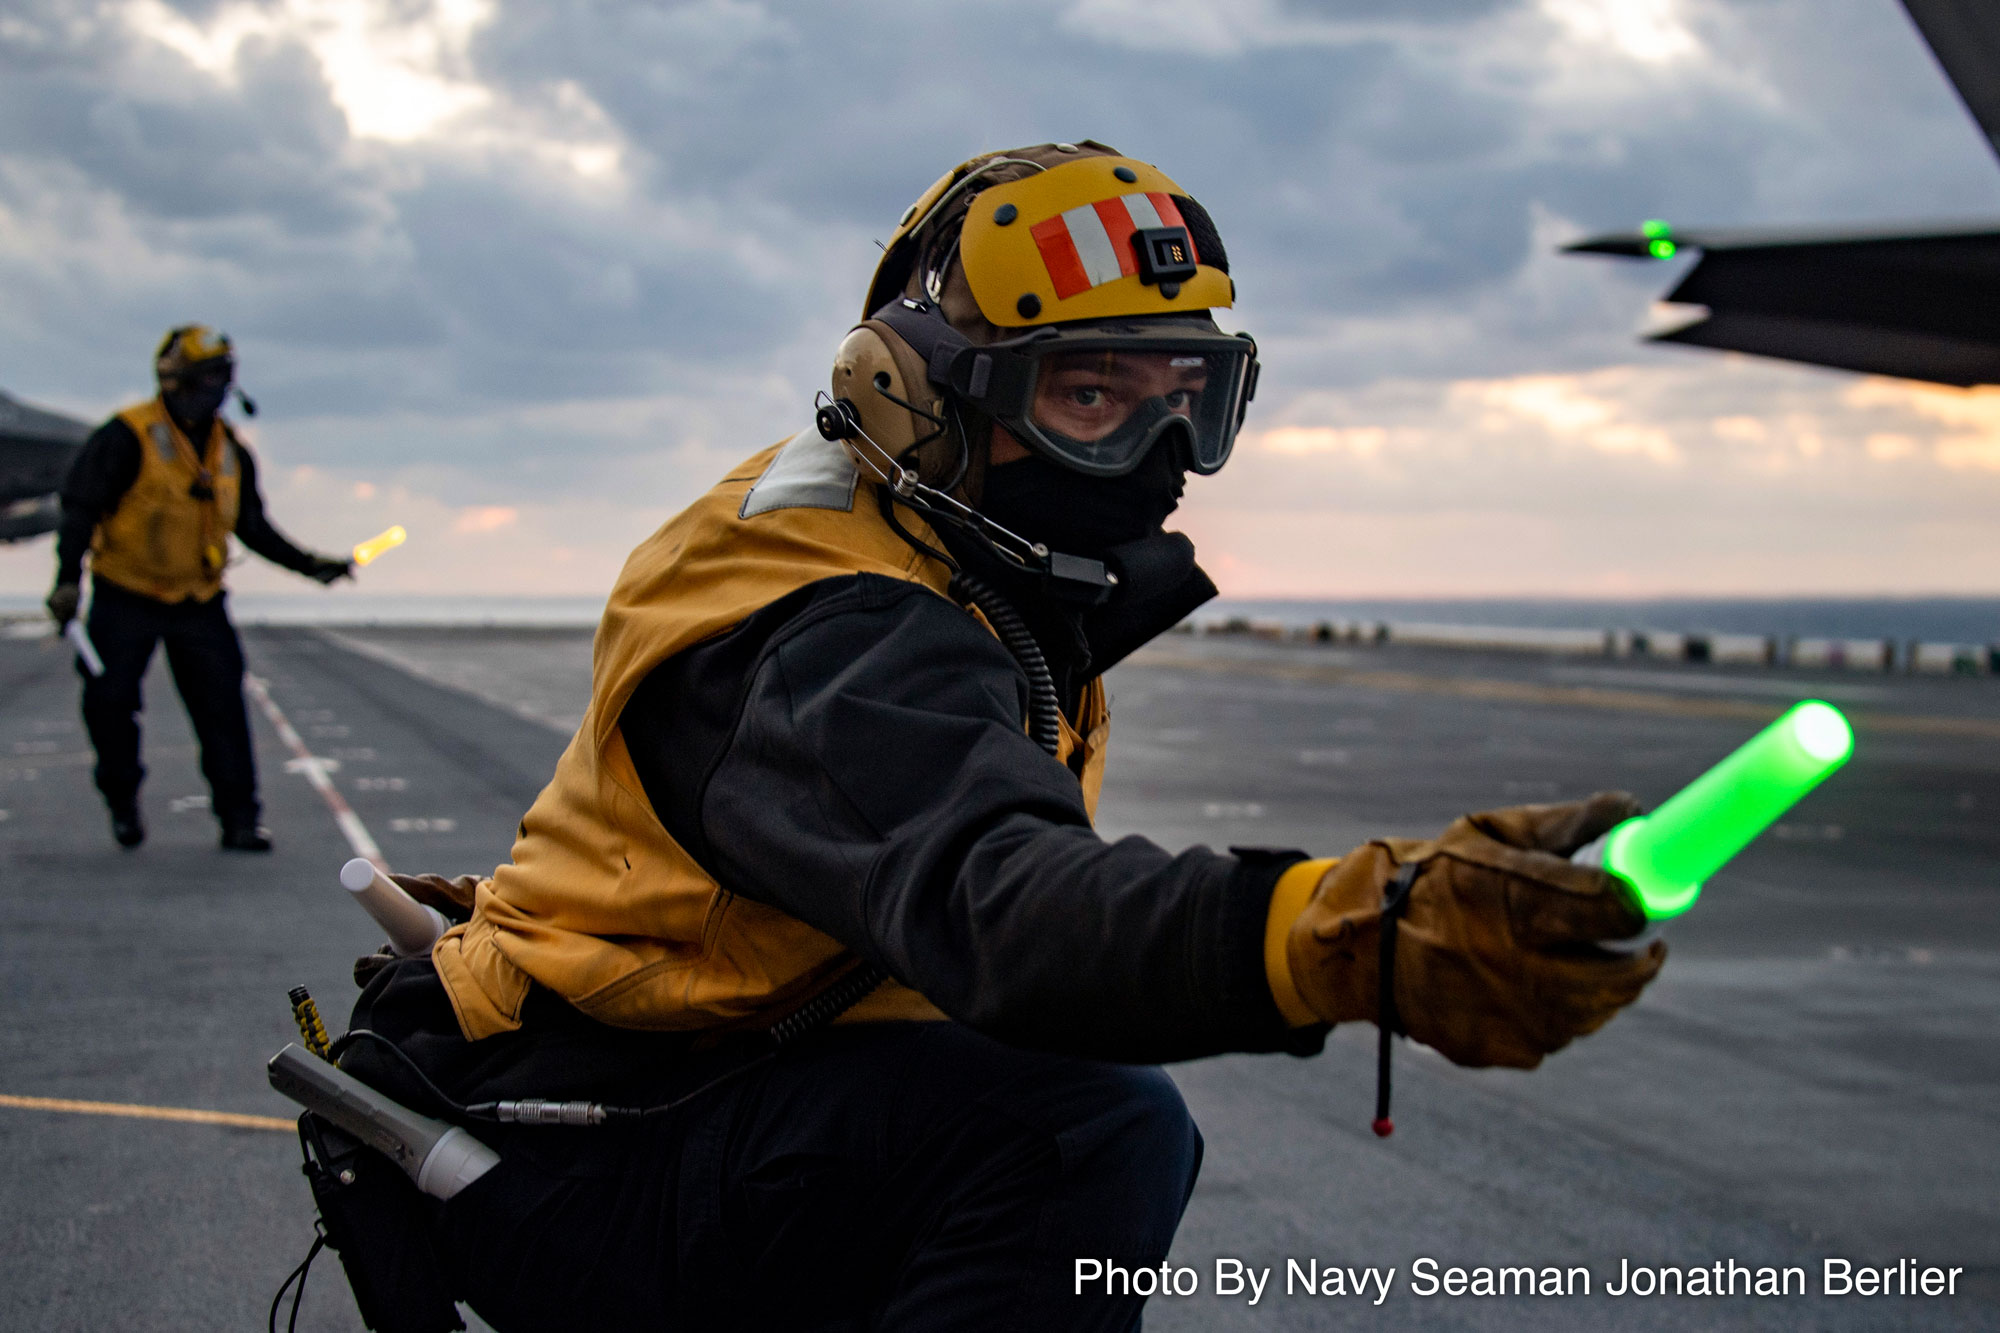 9-Photo-By-Navy-Seaman-Jonathan-Berlier-2.jpg